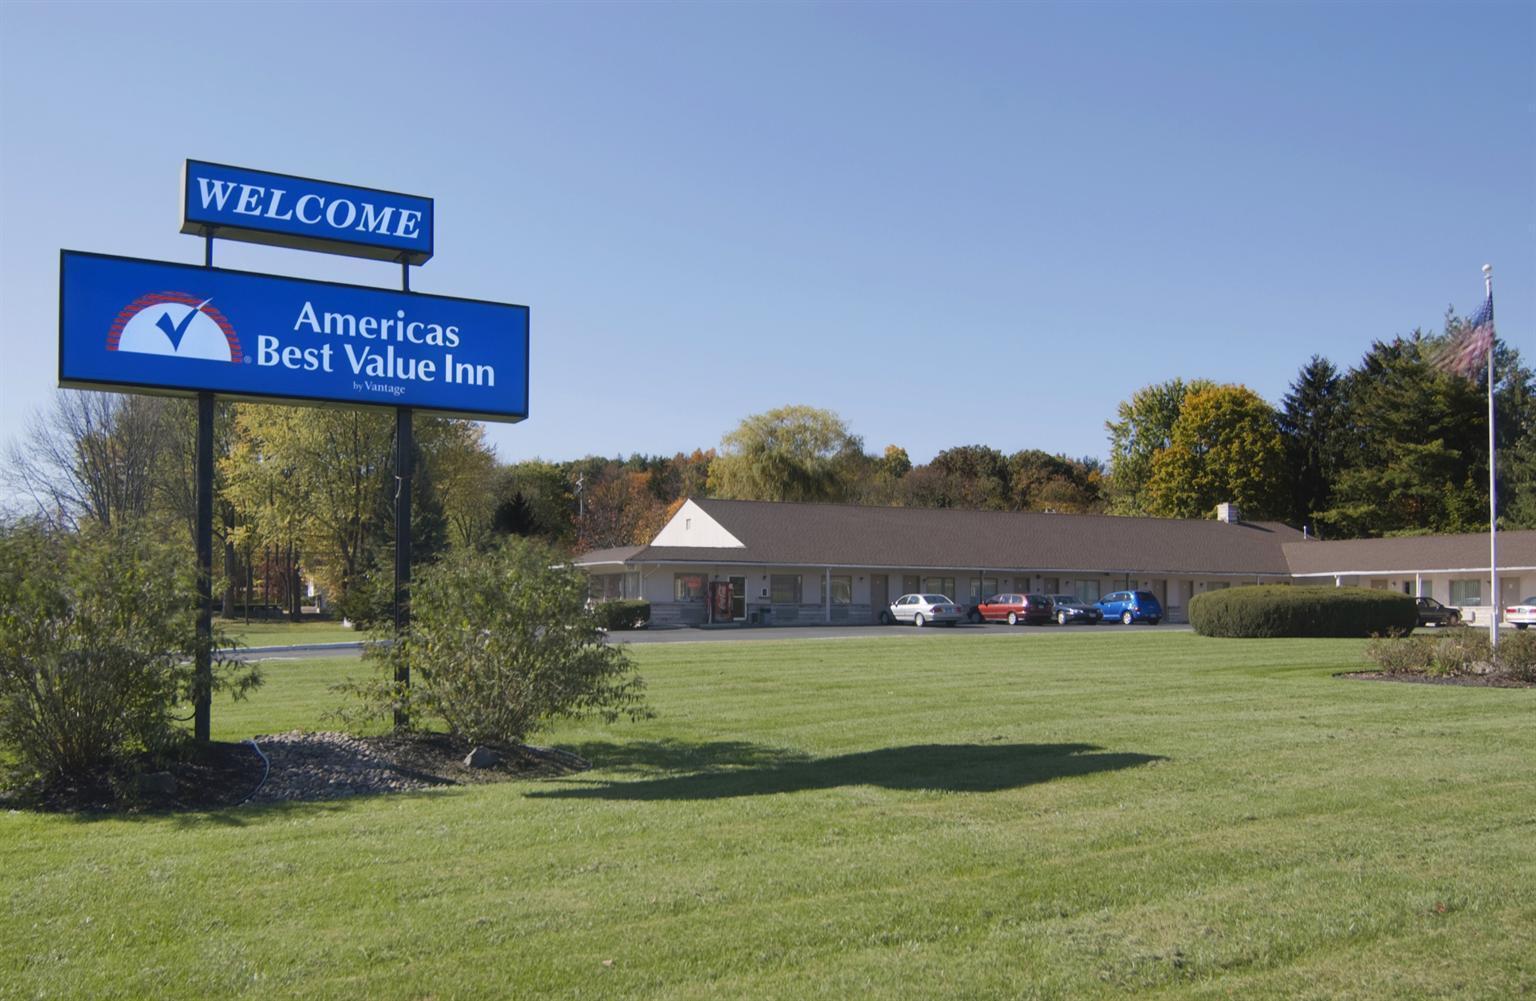 Americas Best Value Inn Central Valley